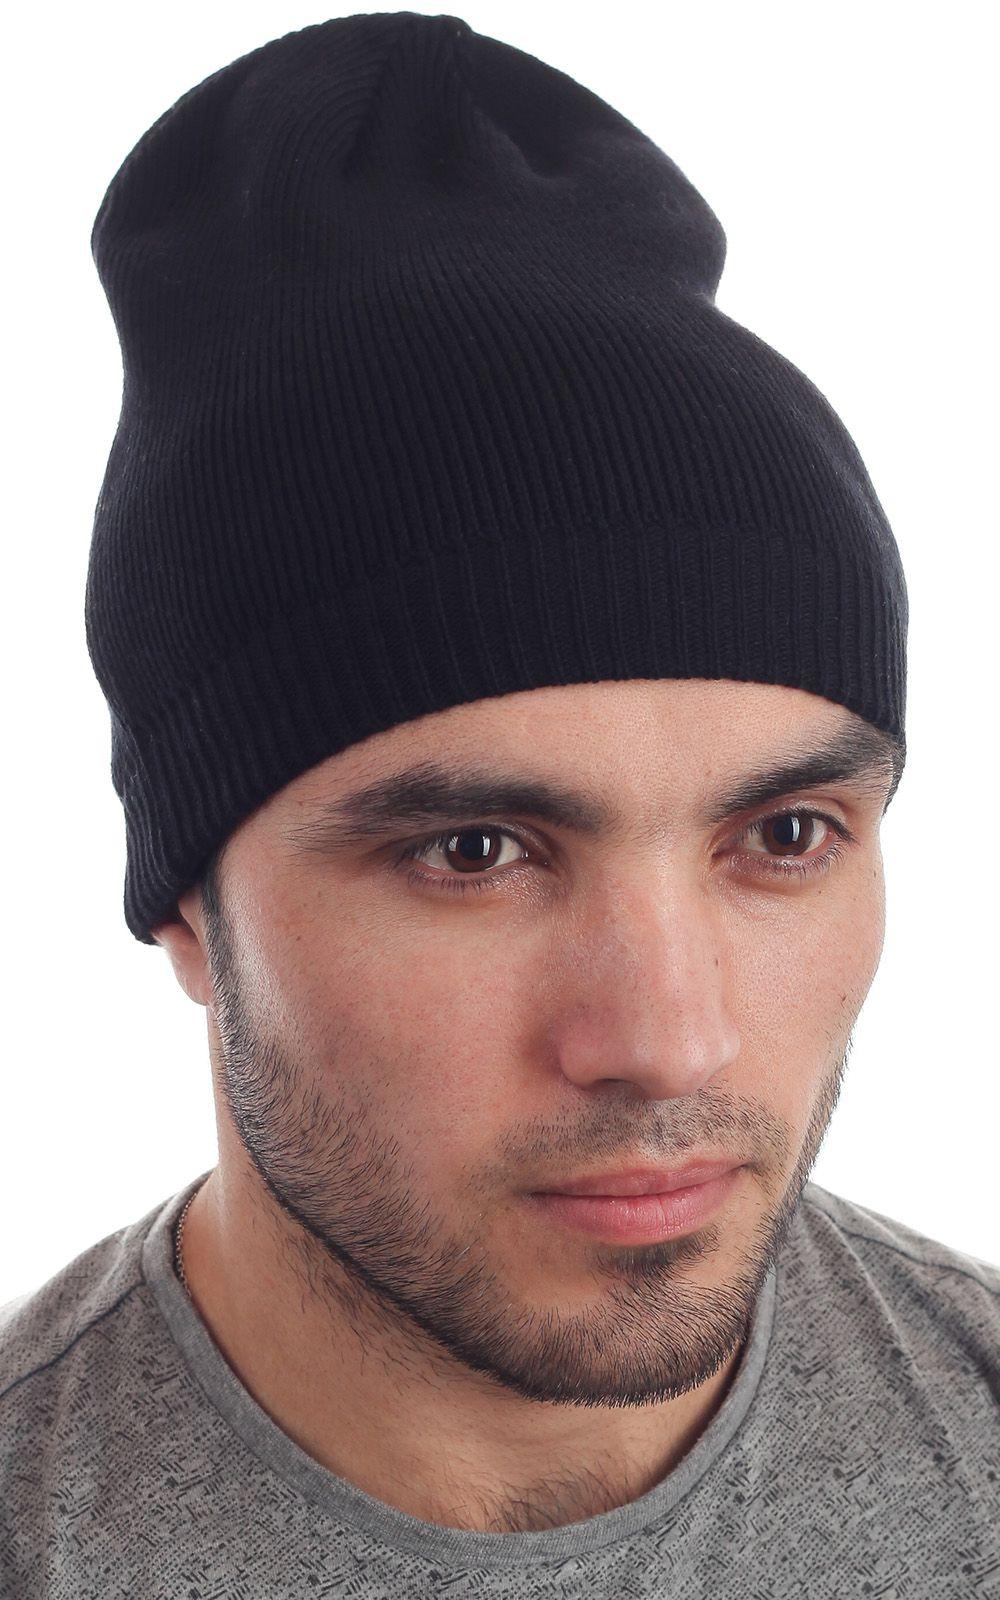 Черная вязаная мужская шапка-носок